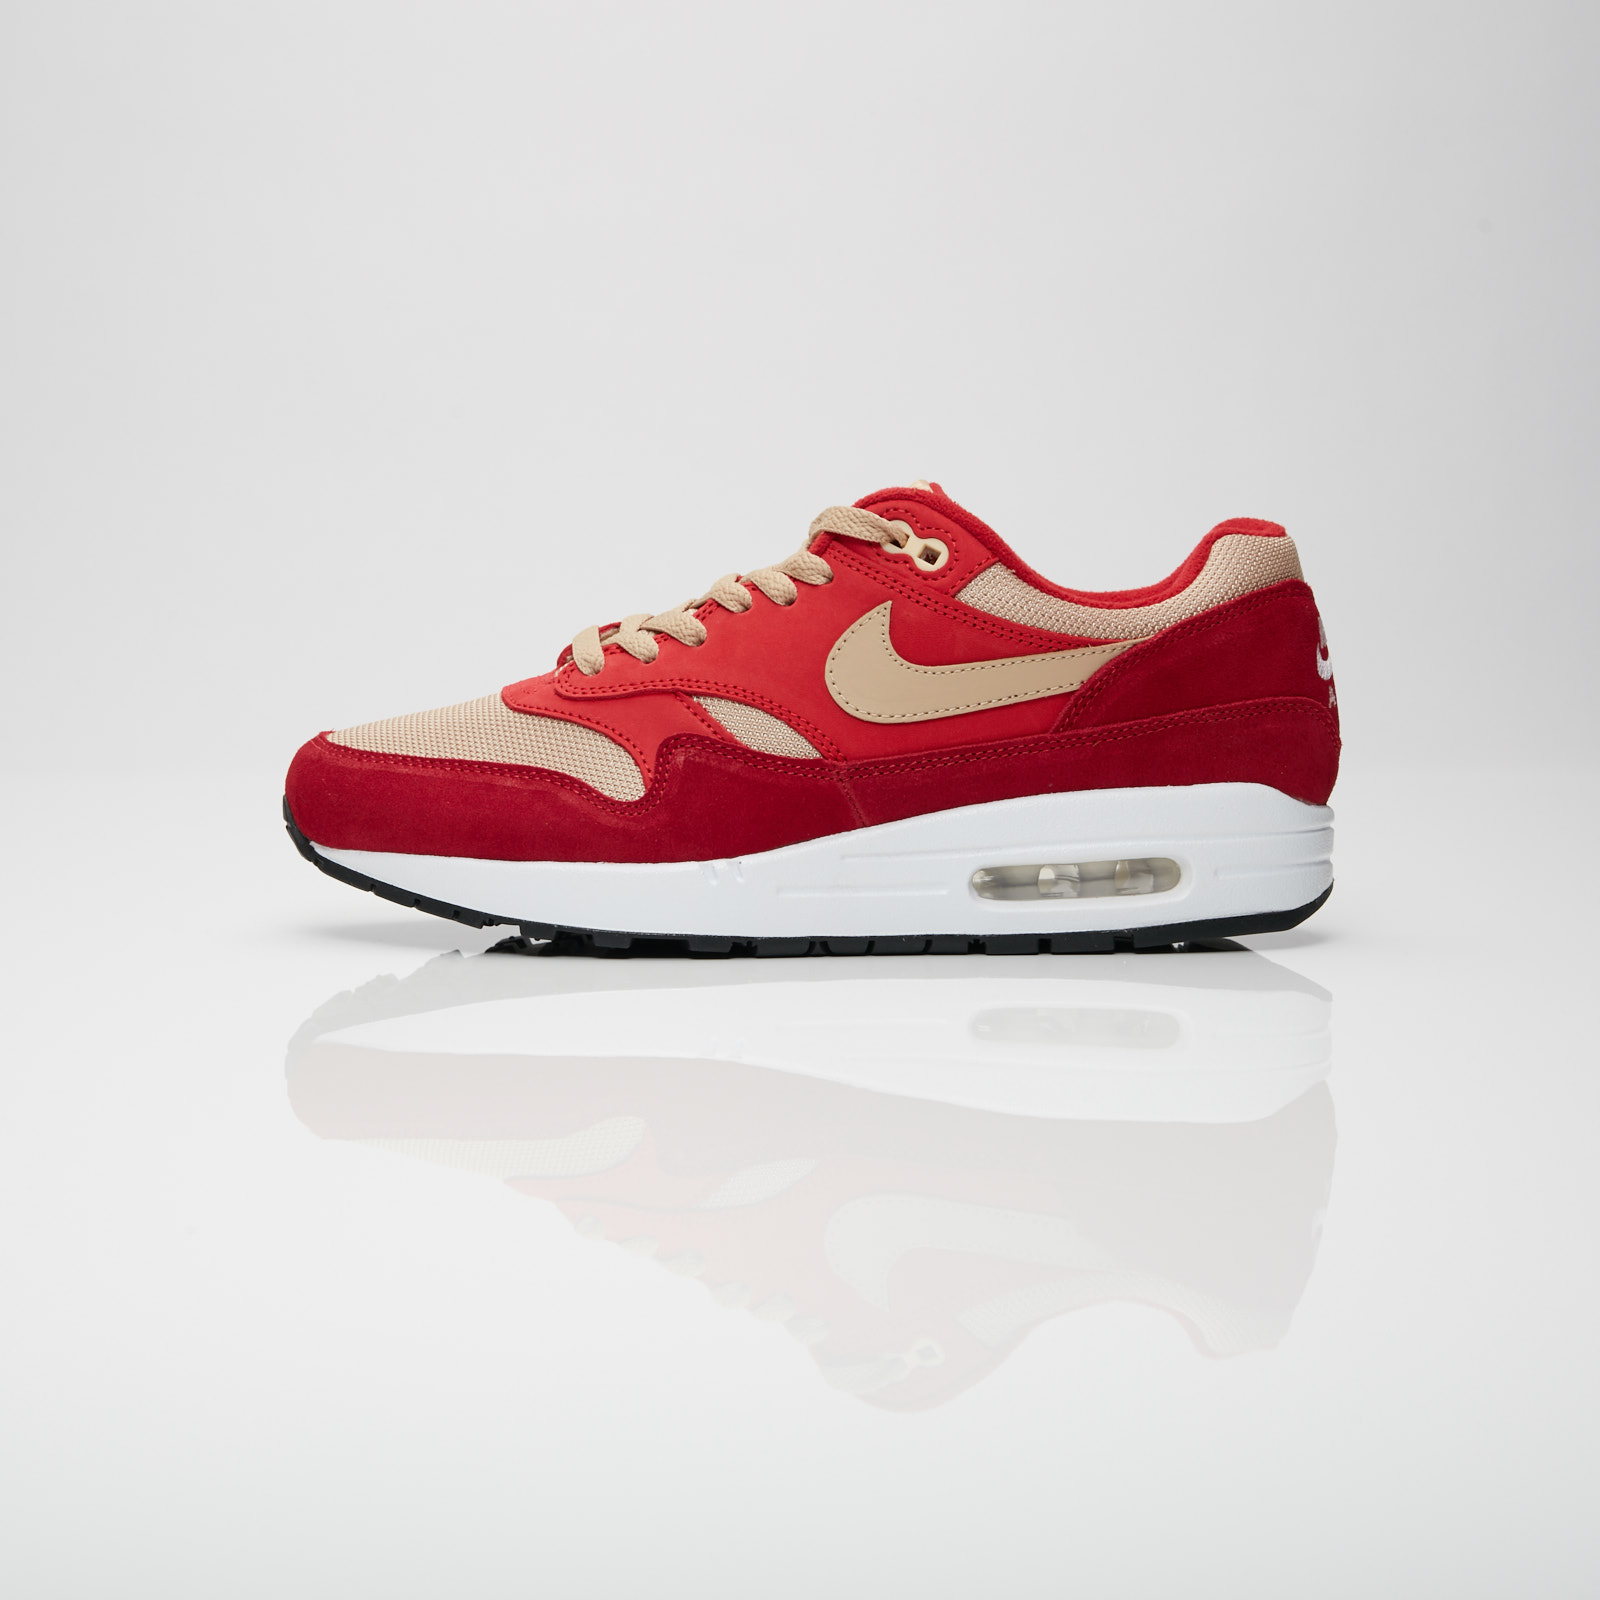 NIKE Air Max 1 Premium Retro Mens Trainers 908366 Sneakers Shoes